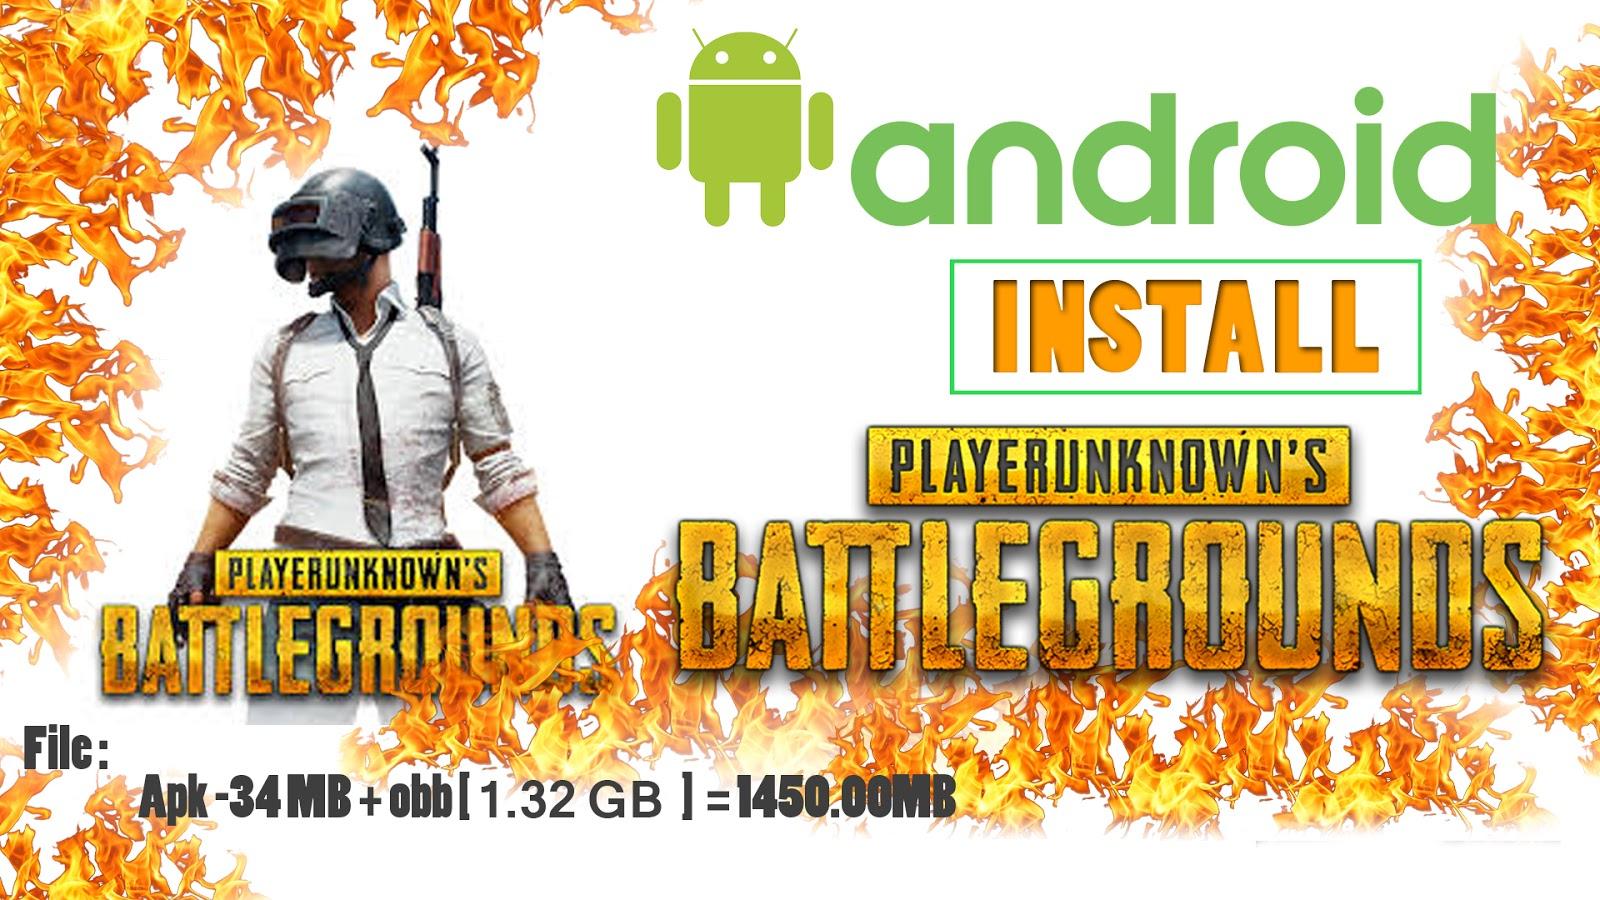 pubg mobile apk free download uptodown